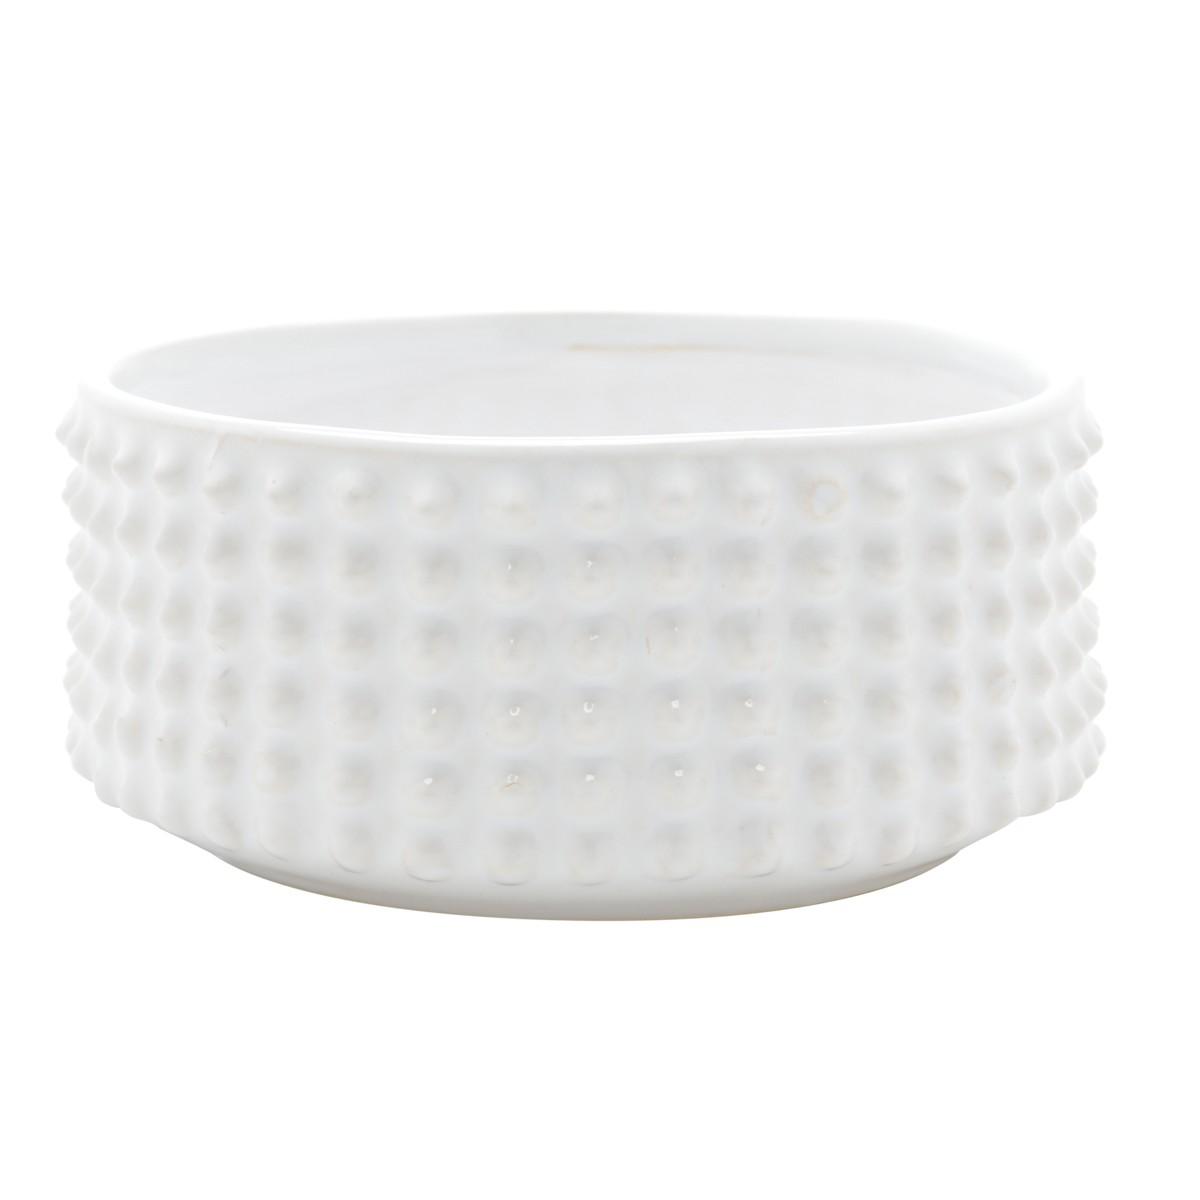 Vaso Decorativo de Cerâmica Spikes Branco